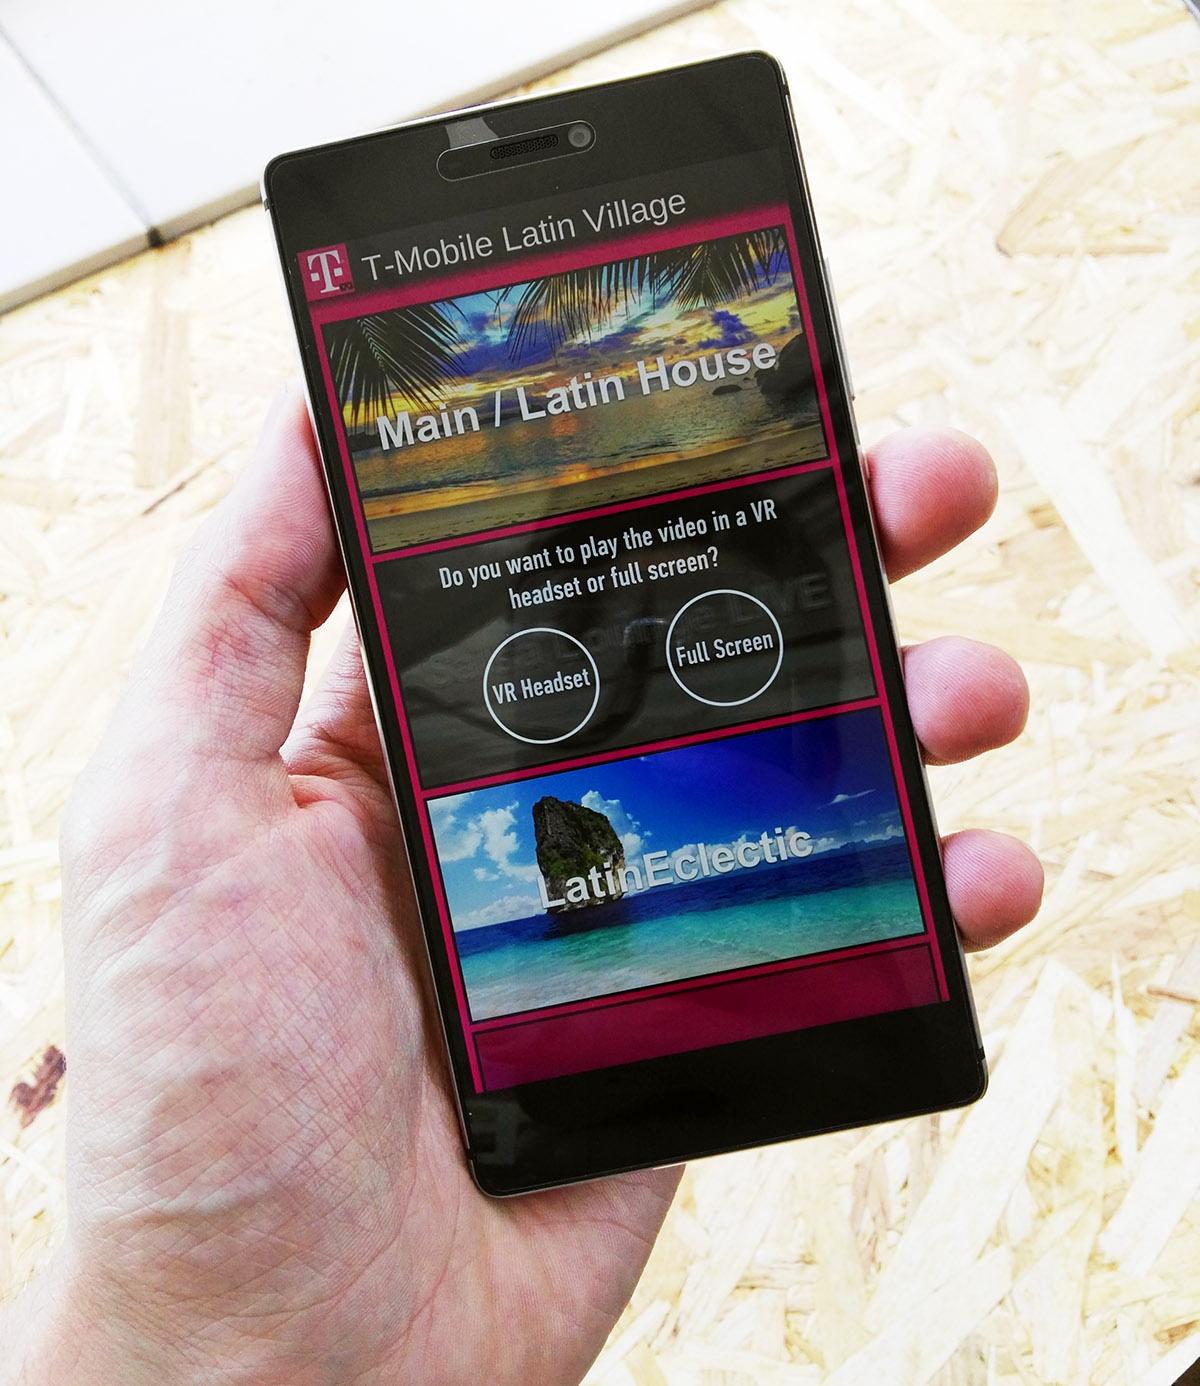 T-Mobile Latin Village app